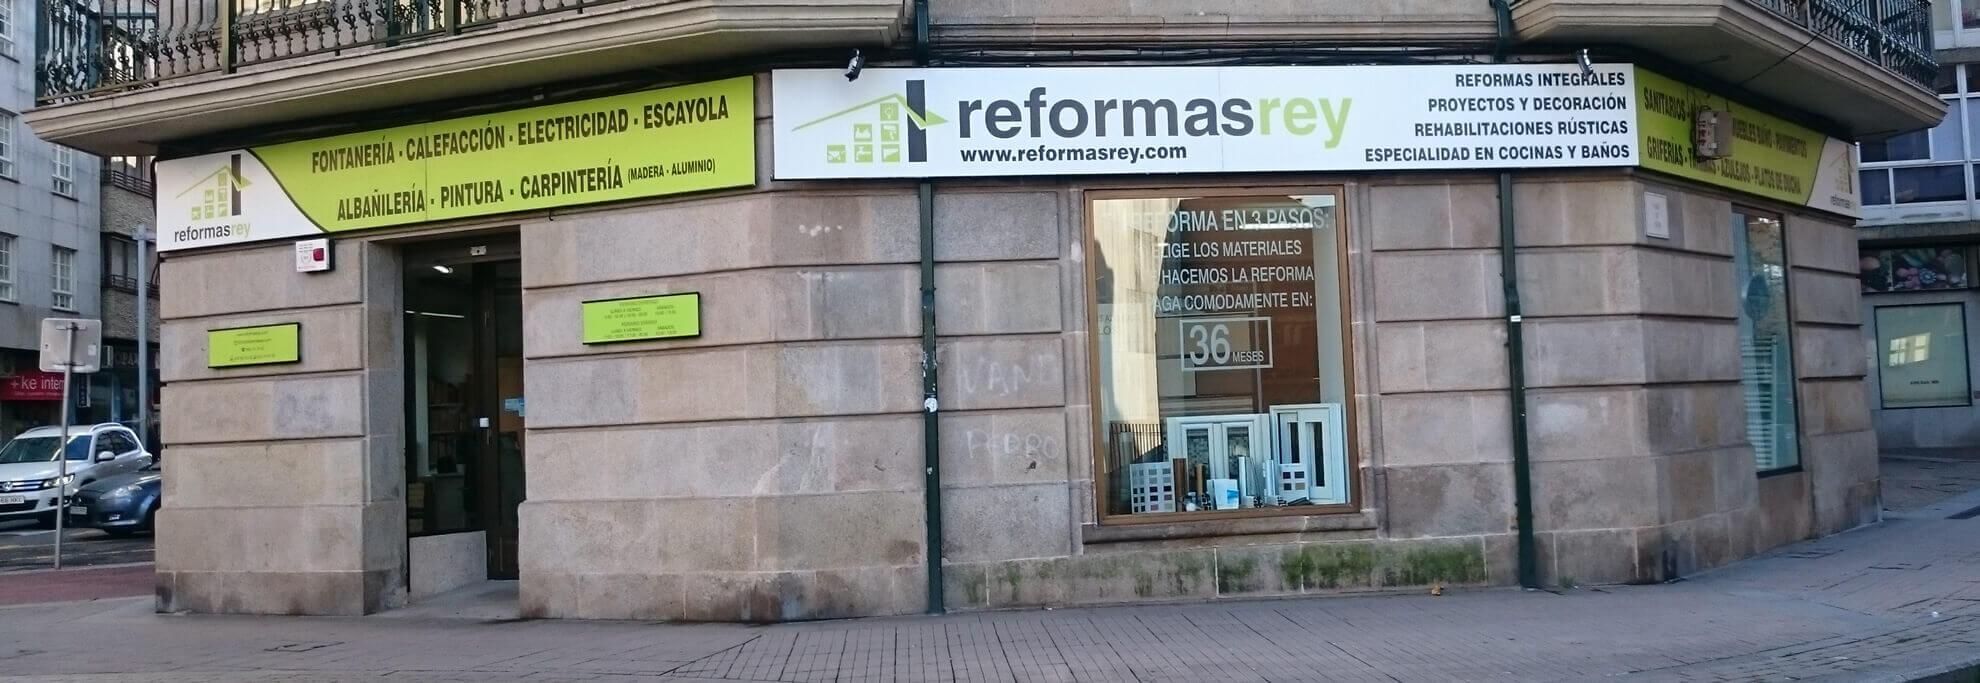 Fechada | Reformas Pontevedra − Reformas Rey